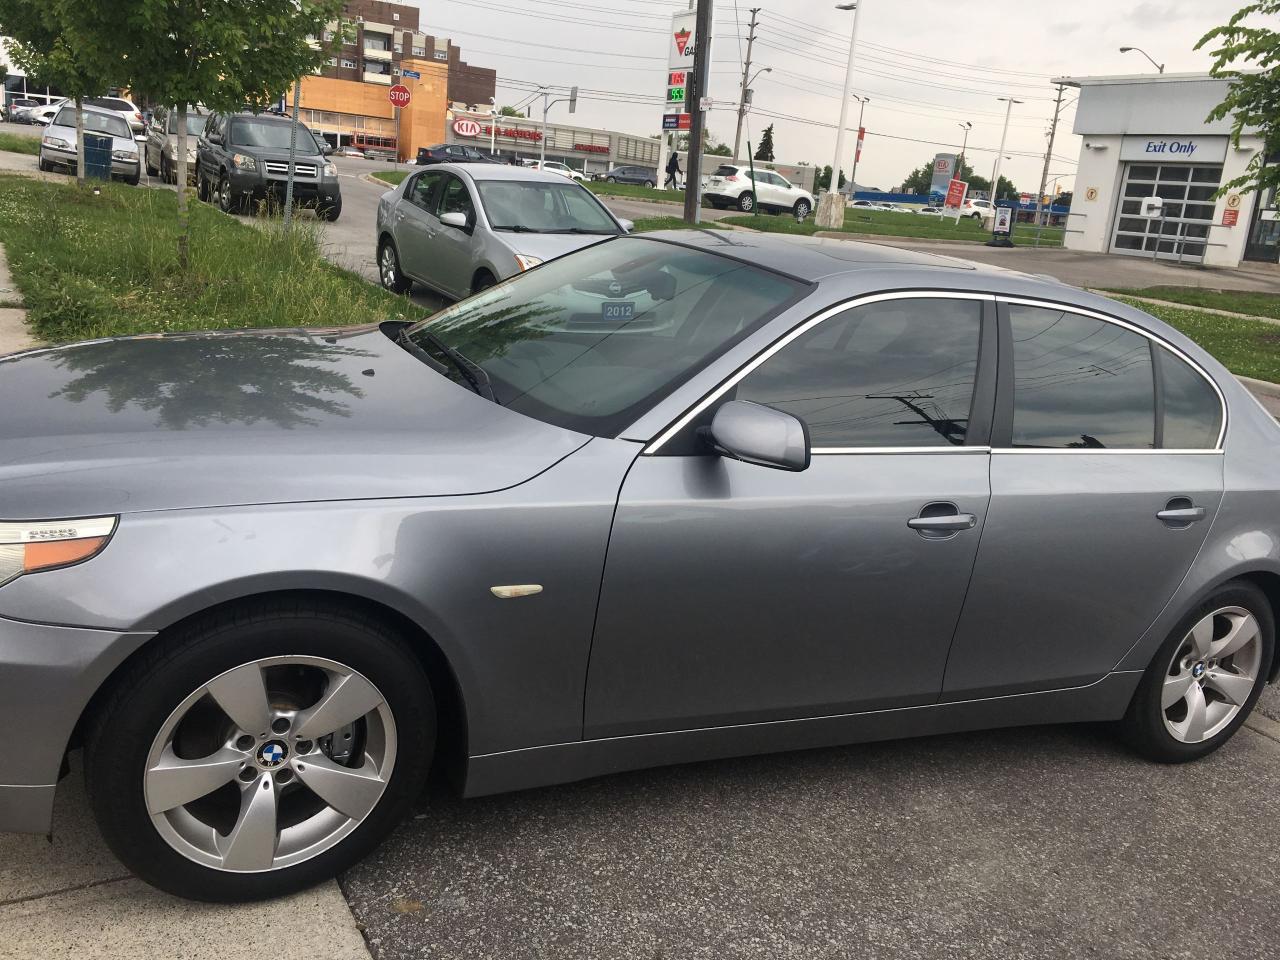 Photo of Gray 2005 BMW 5 Series